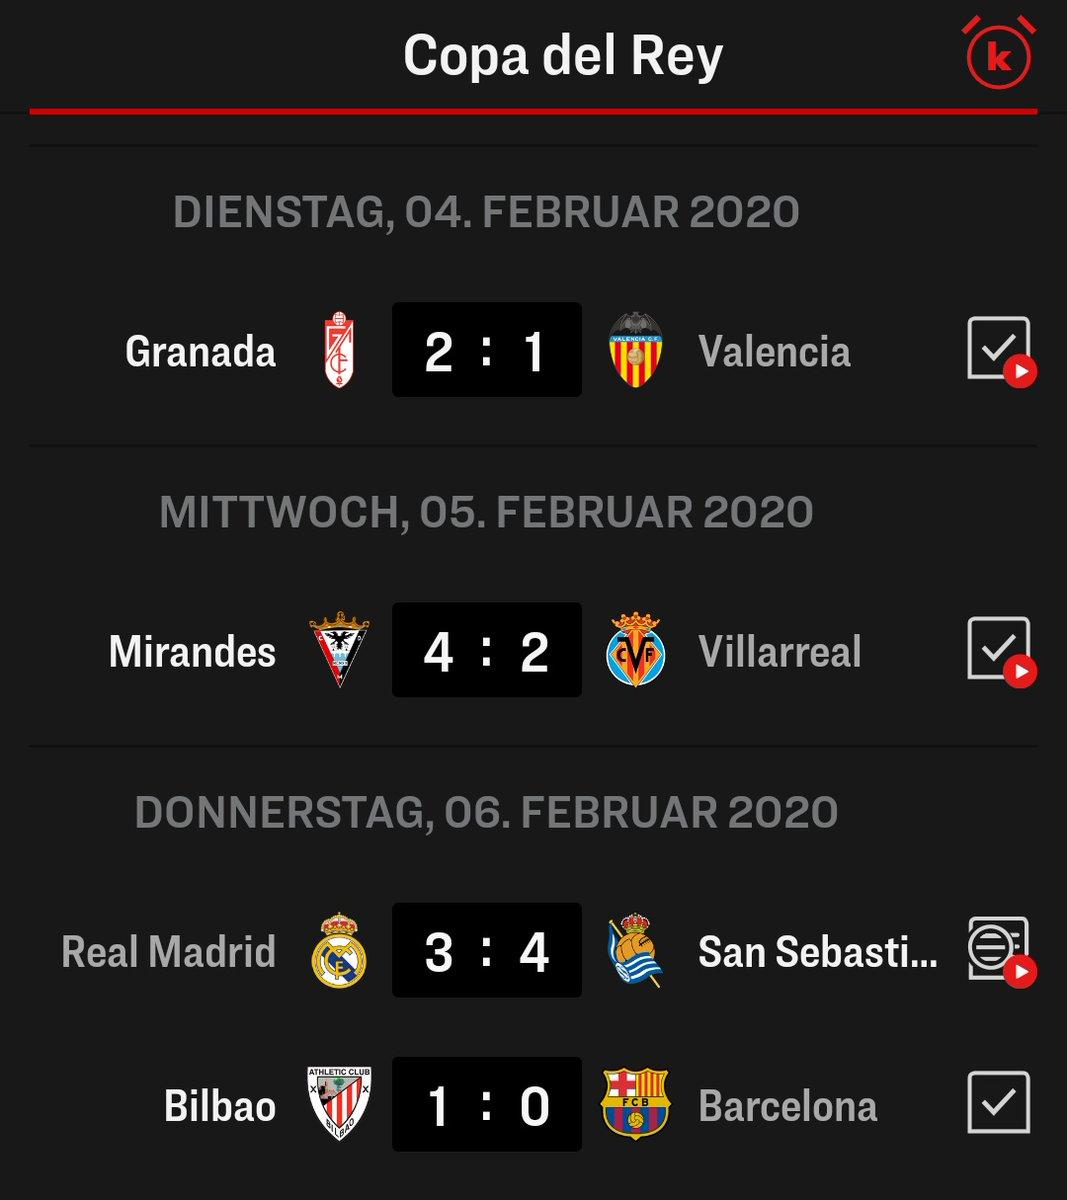 #CopaDelRey